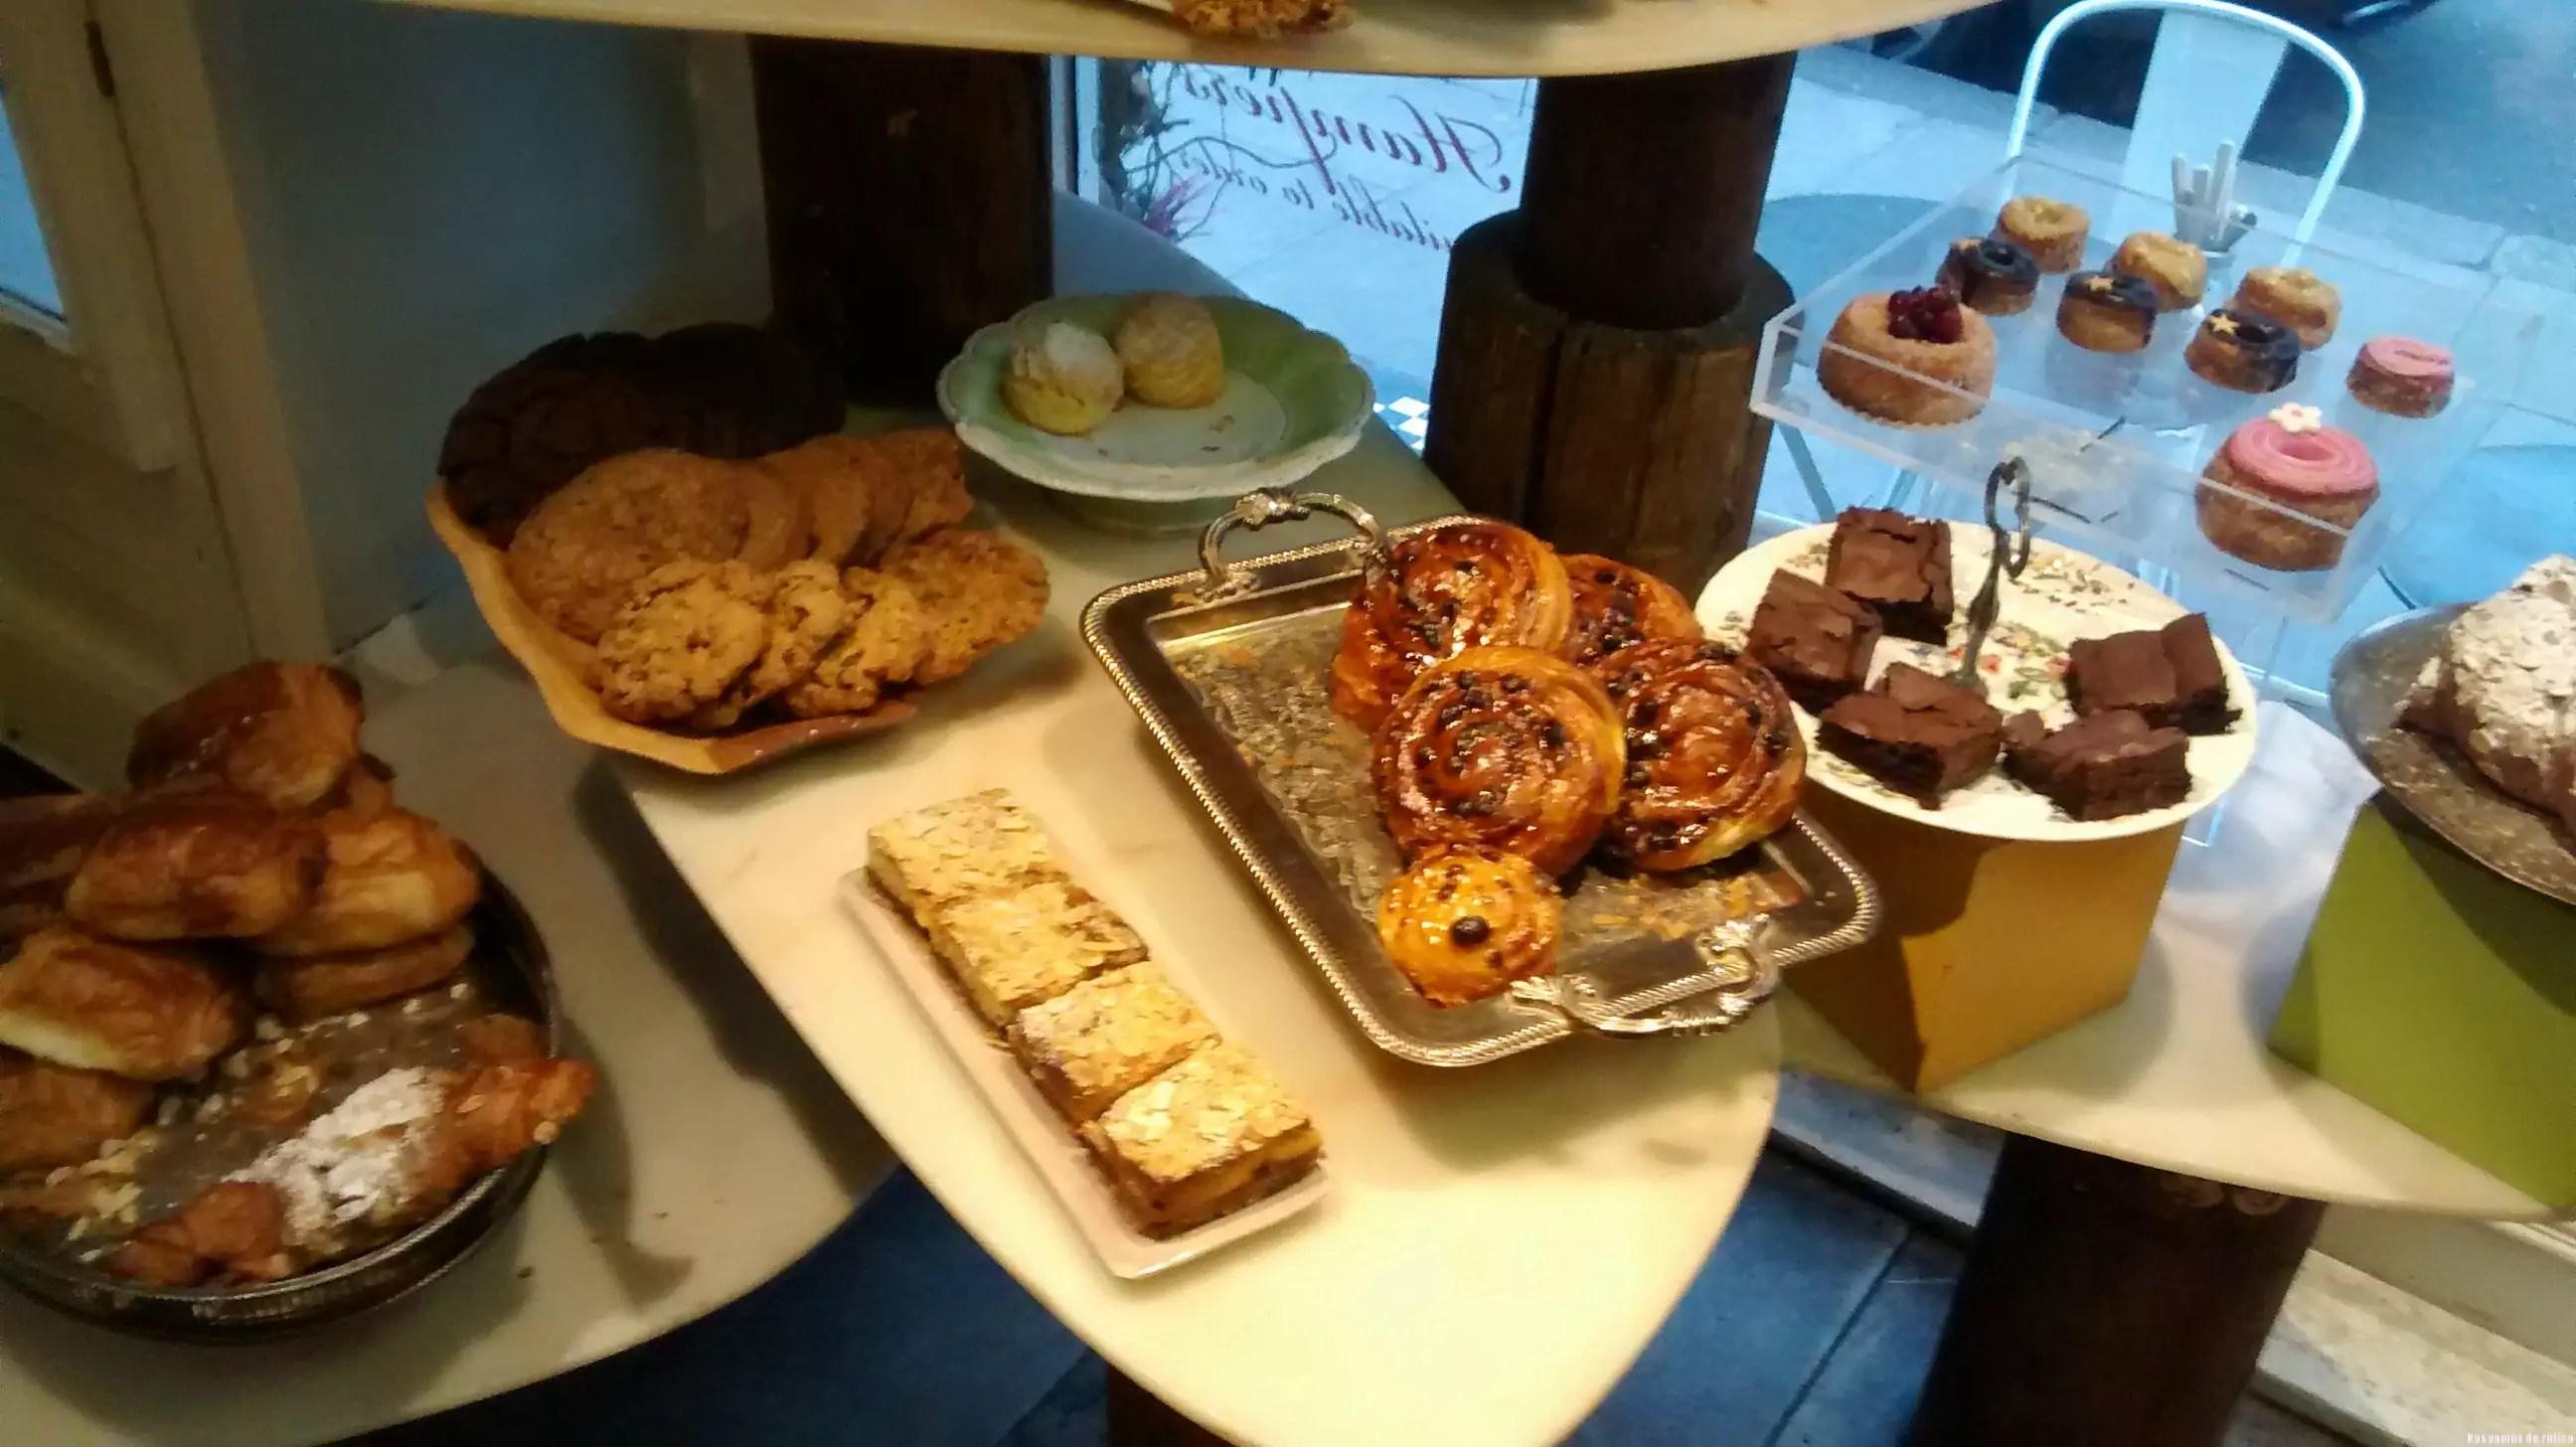 Mi peque a cafeter a en londres nos vamos de rutica - Decoracion de cafeterias pequenas ...